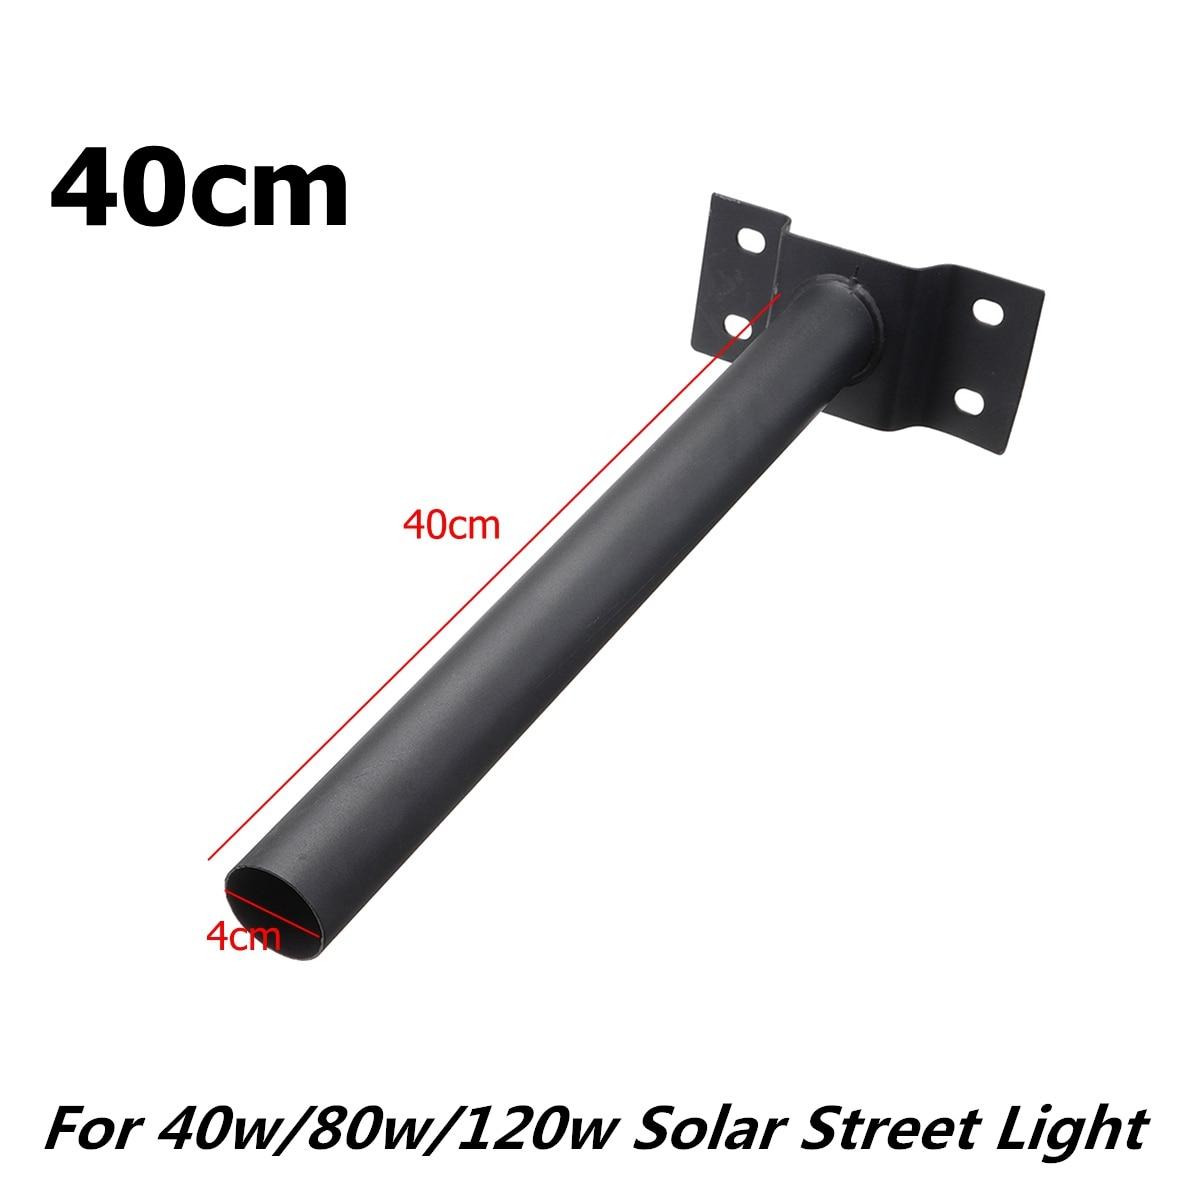 Dropship 40 W/80 W/120 W LED Wand Lampe Solar Straße Licht 2 In 1 Ständig helle & induktion Radar PIR Motion Sensor Lampe + fernbedienung